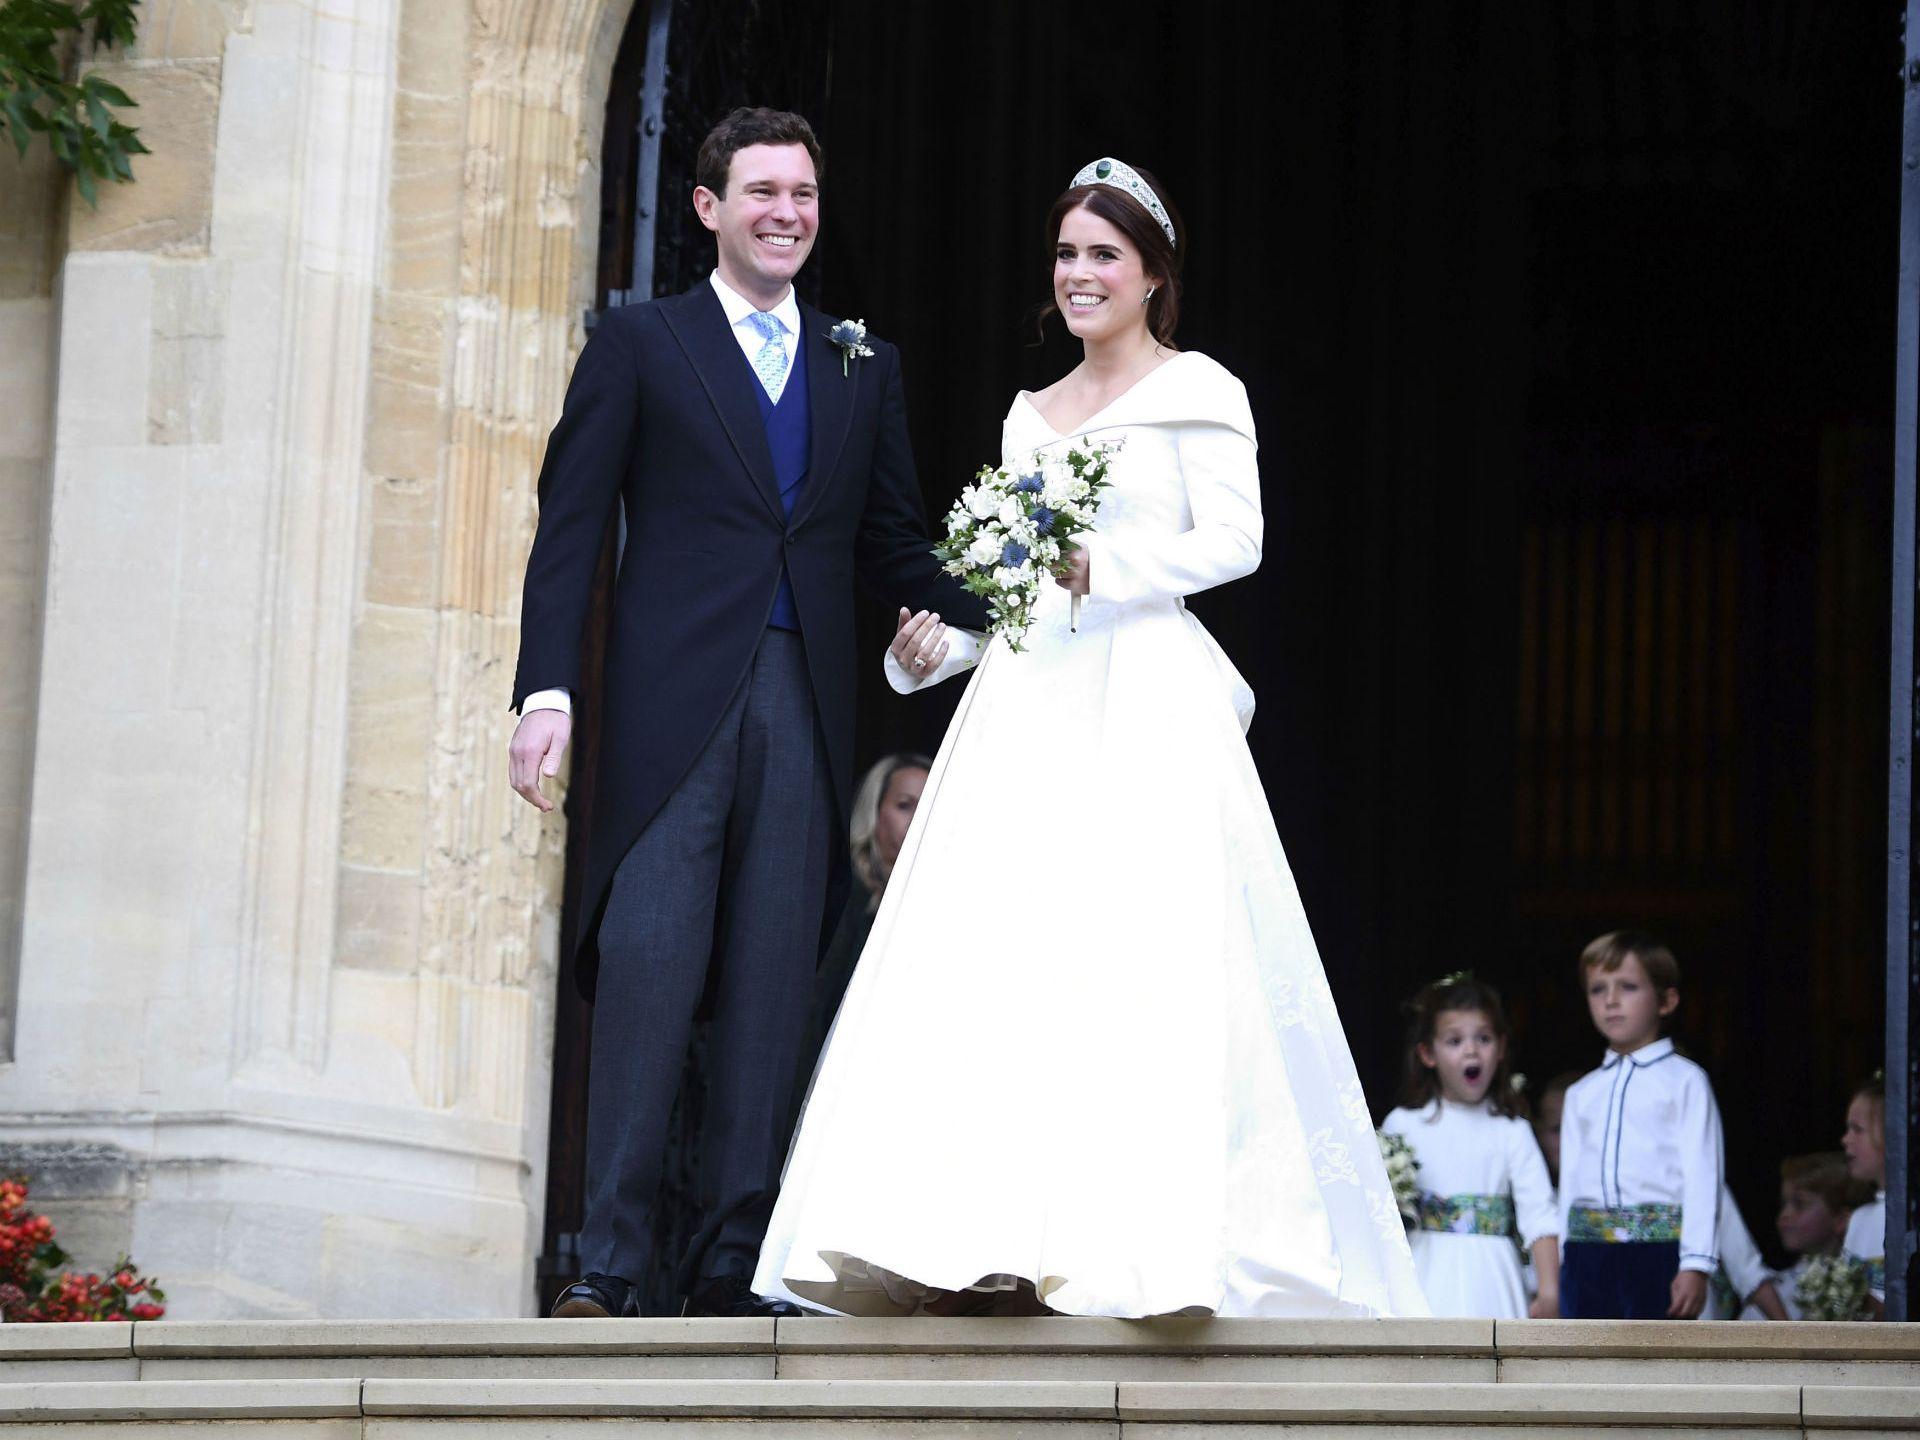 Princess Eugenie wedding_1539346541209.jpg.jpg